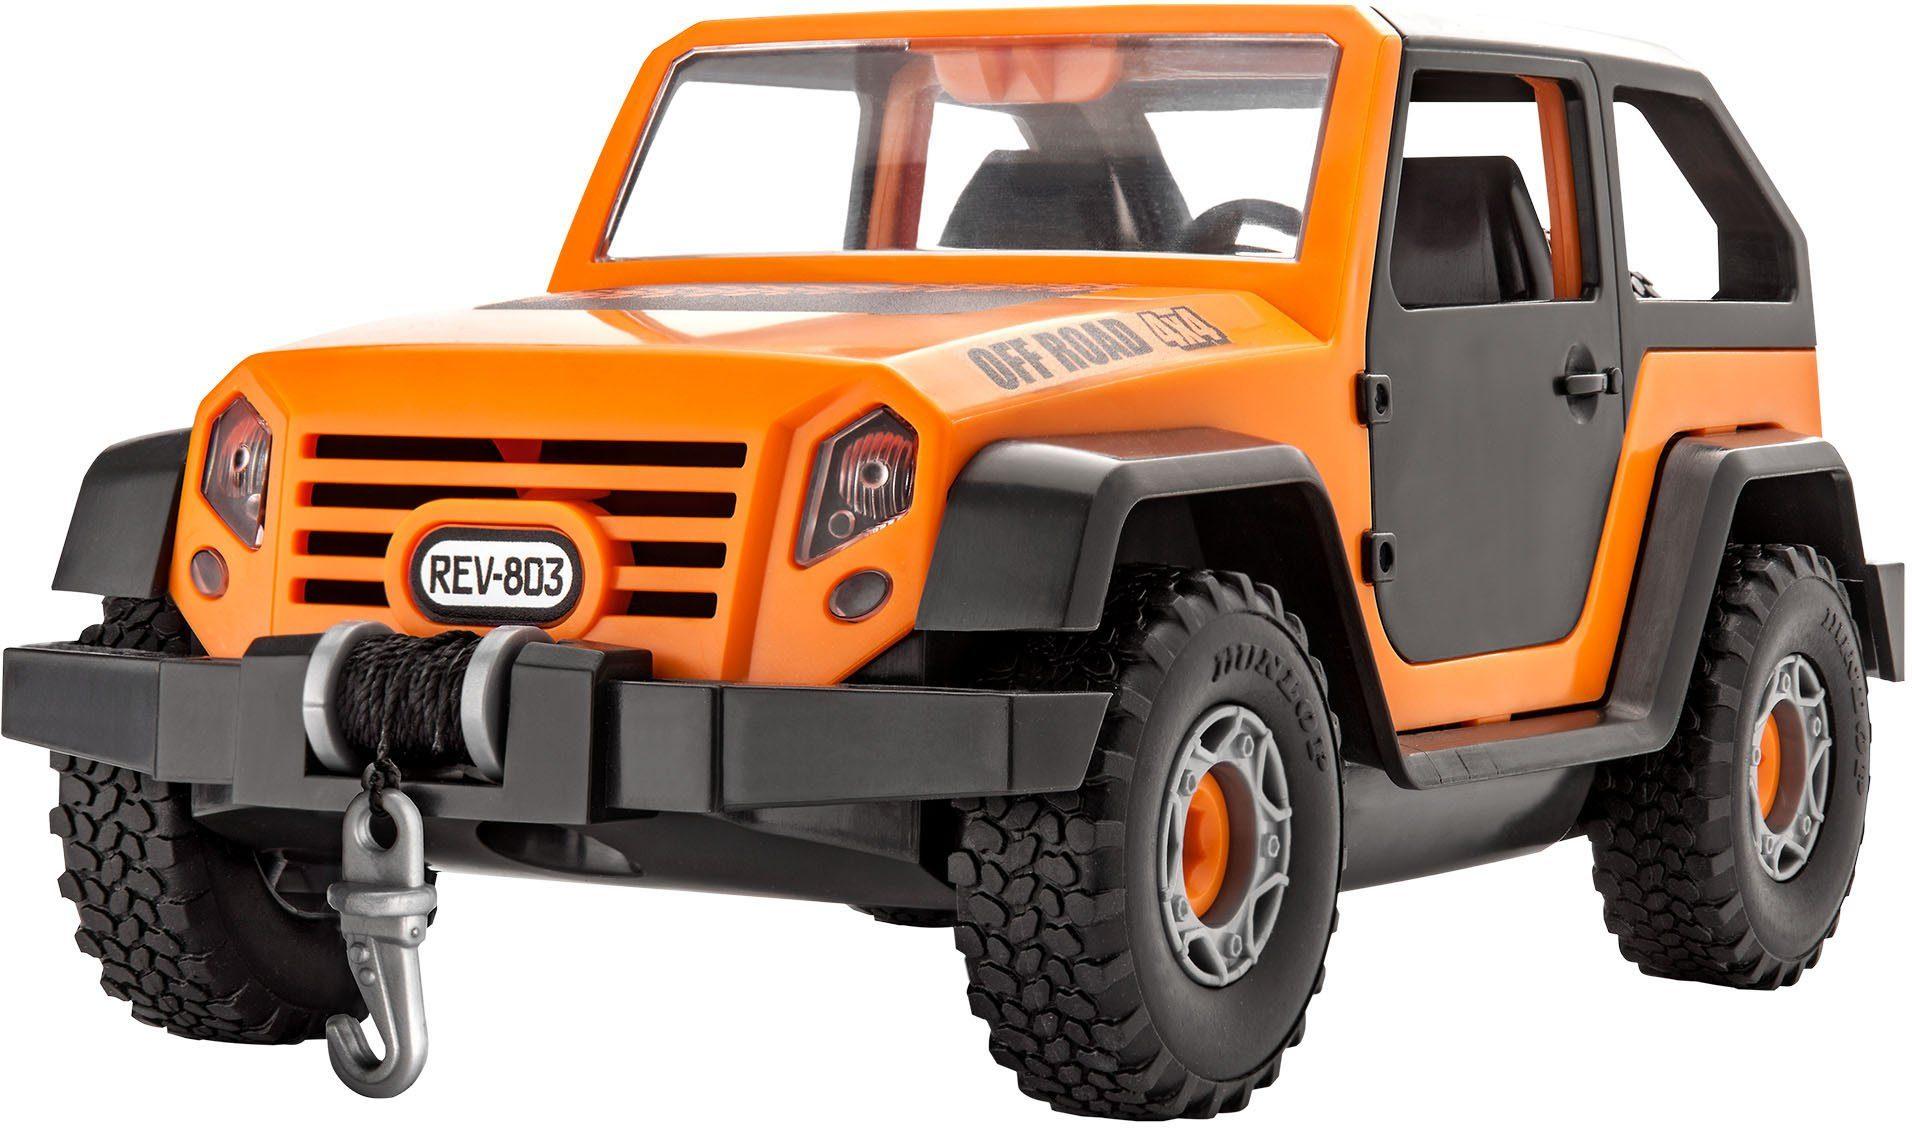 Revell® Modellbausatz Geländewagen, Maßstab 1:20, »Junior Kit Offroad Vehicle«